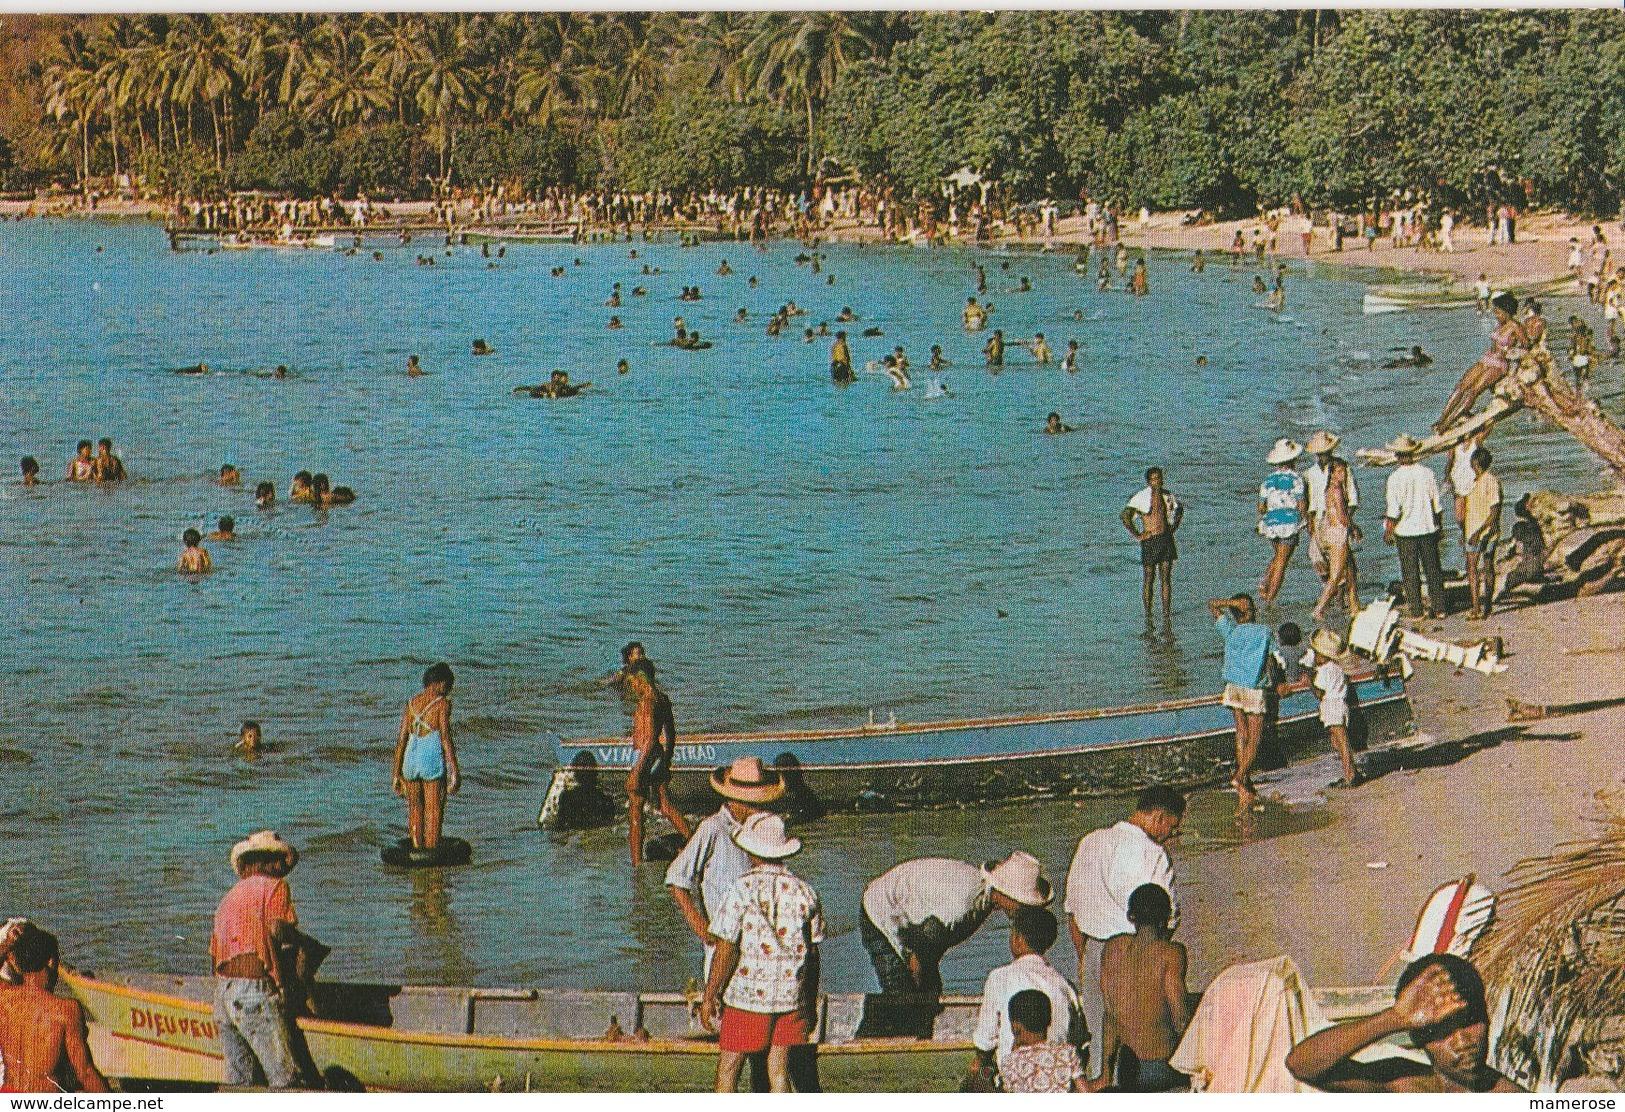 MARTINIQUE L'Anse à L'Ane Lundi De Pâques - Martinique